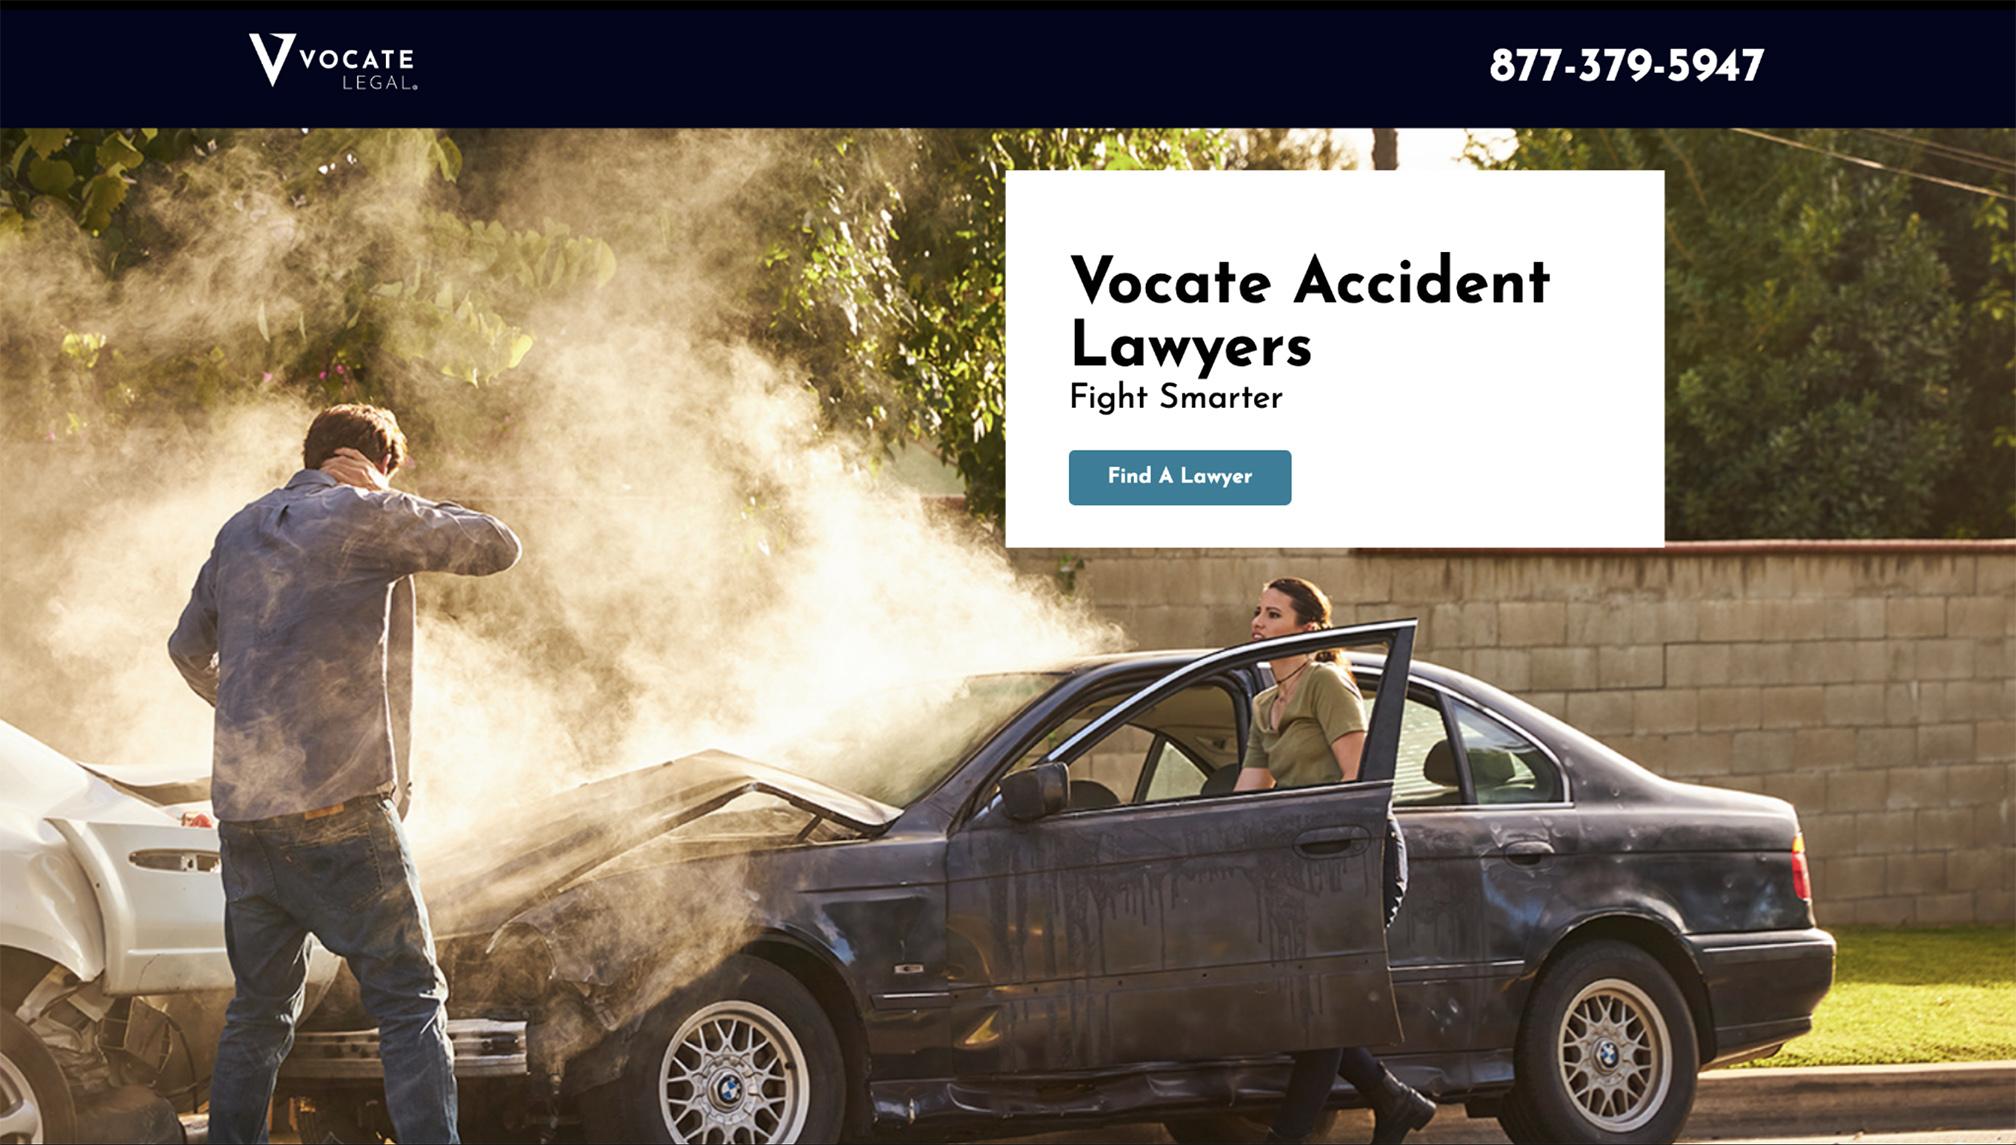 Vocate-Website-Front